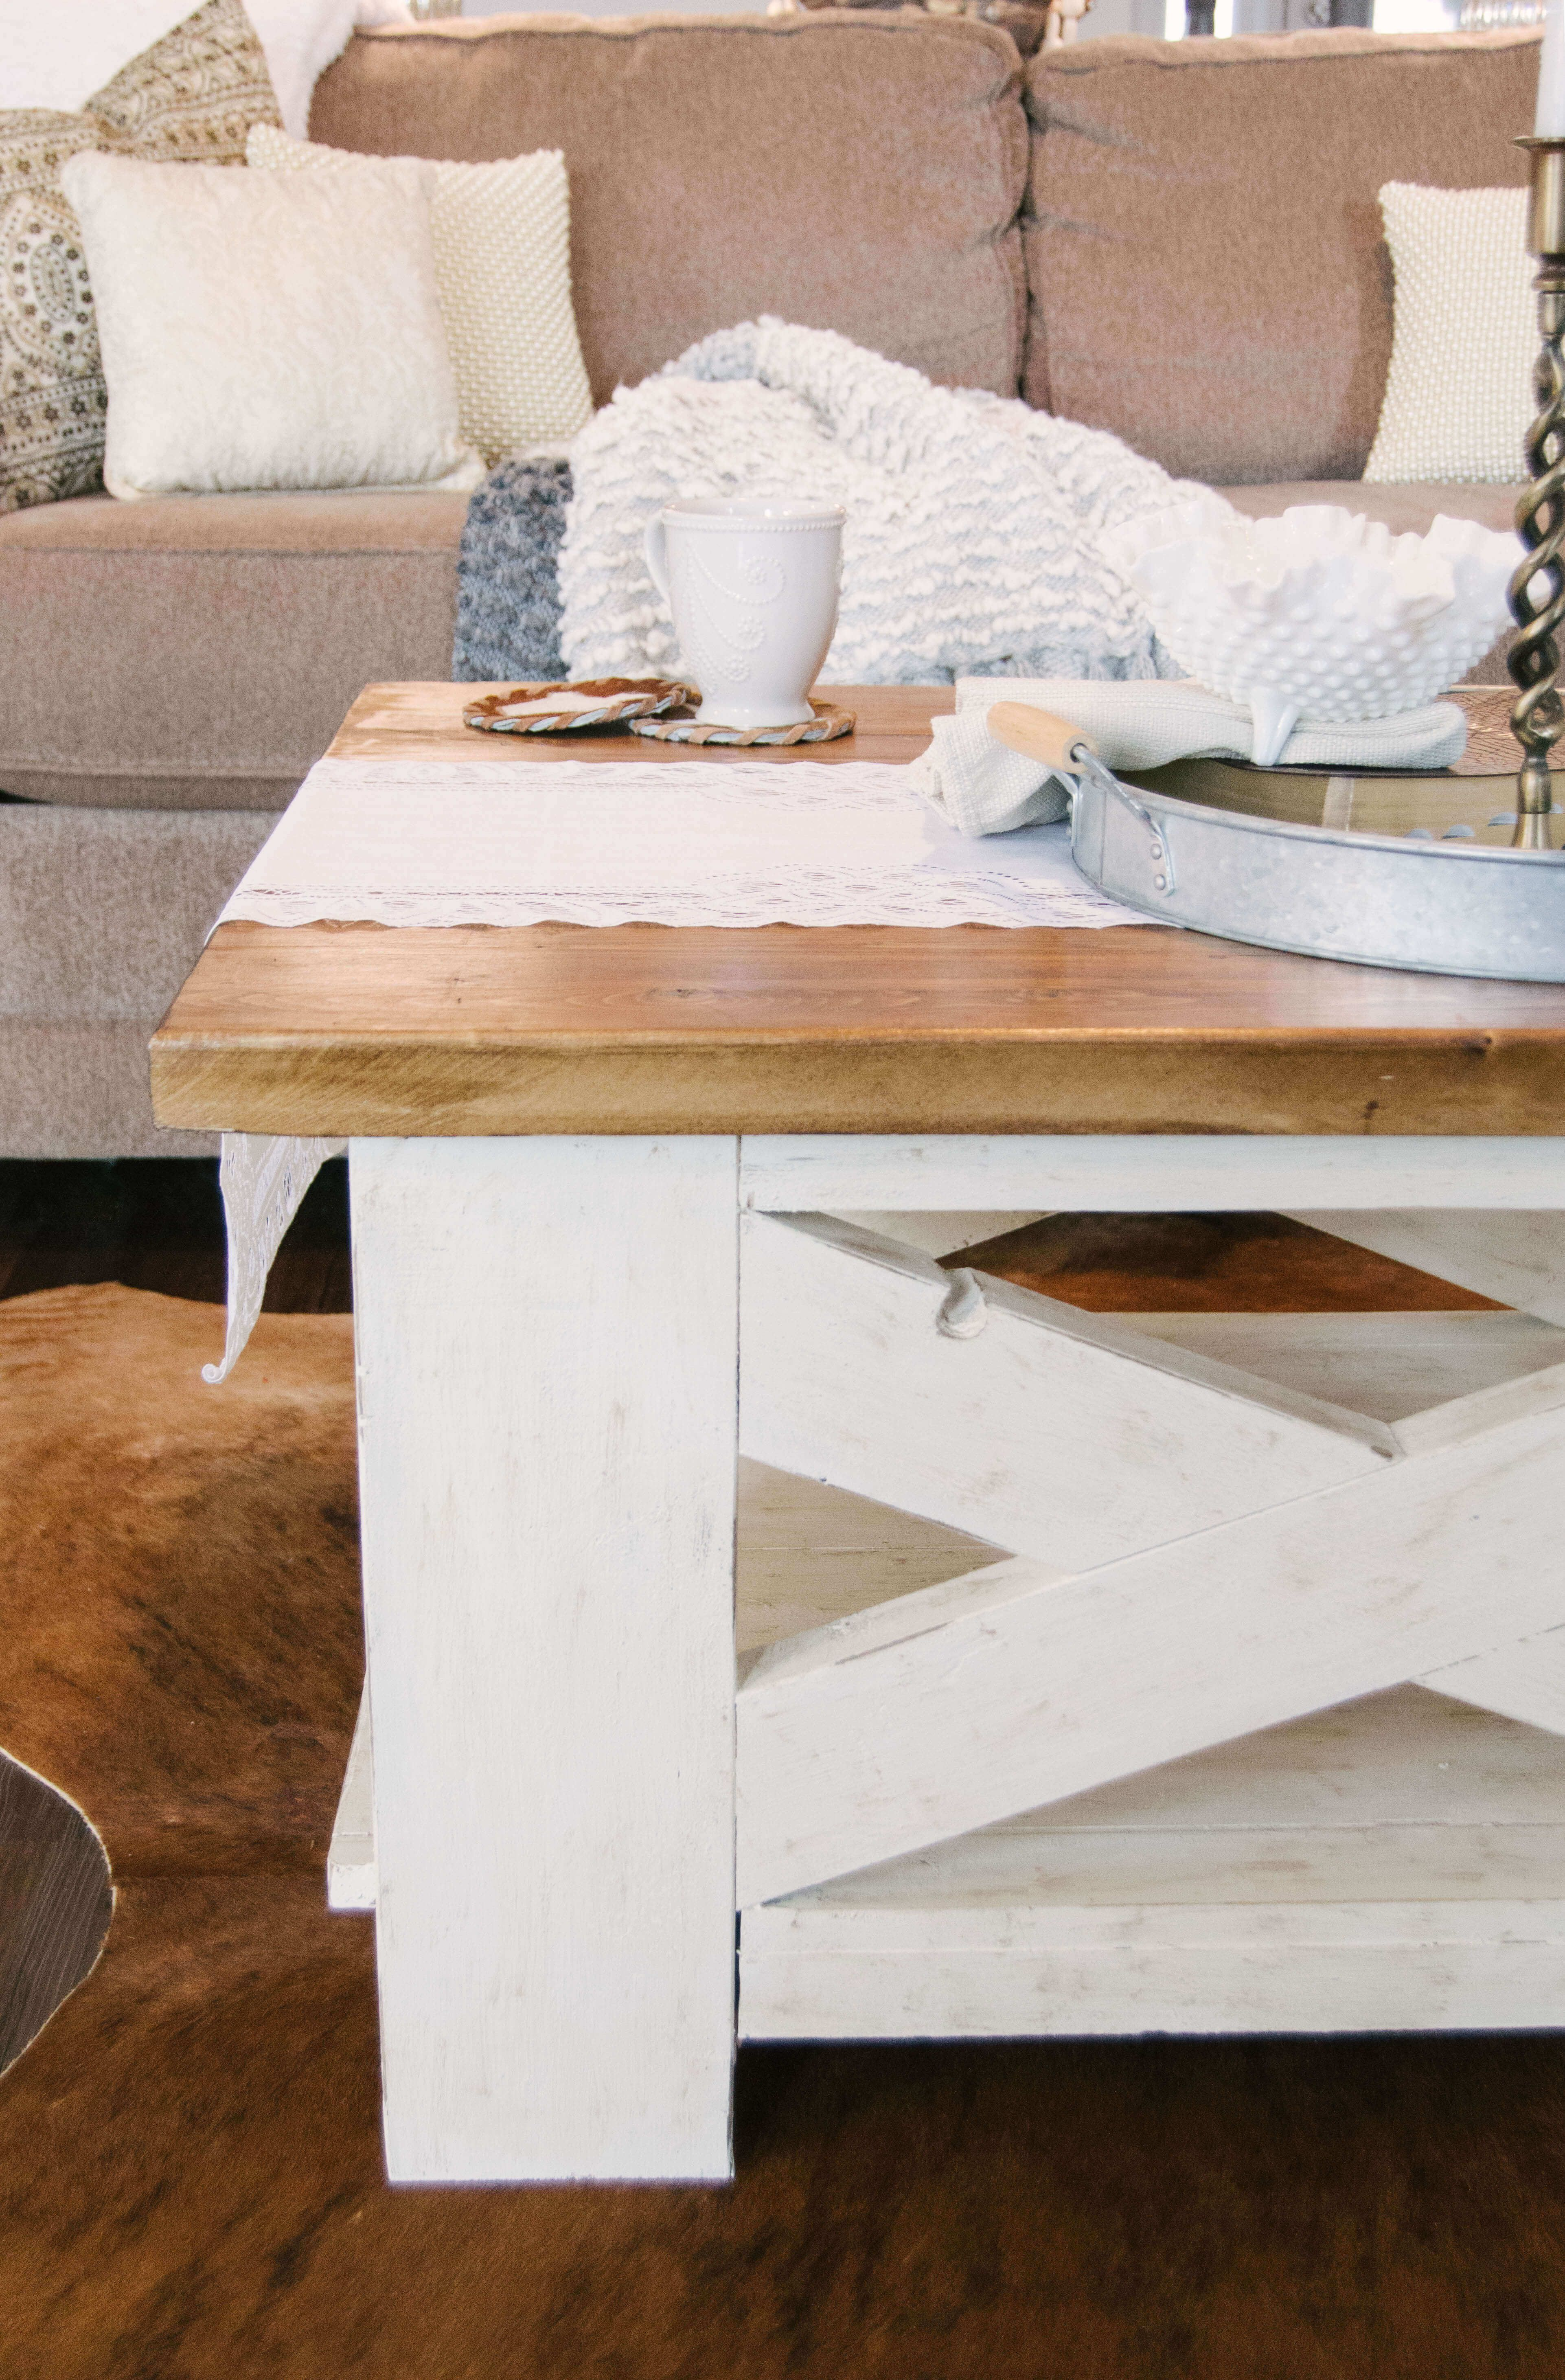 Handcrafted Farmhouse Coffee Table, Diy Farmhouse, Farmhouse Style, Farmhouse Decor,